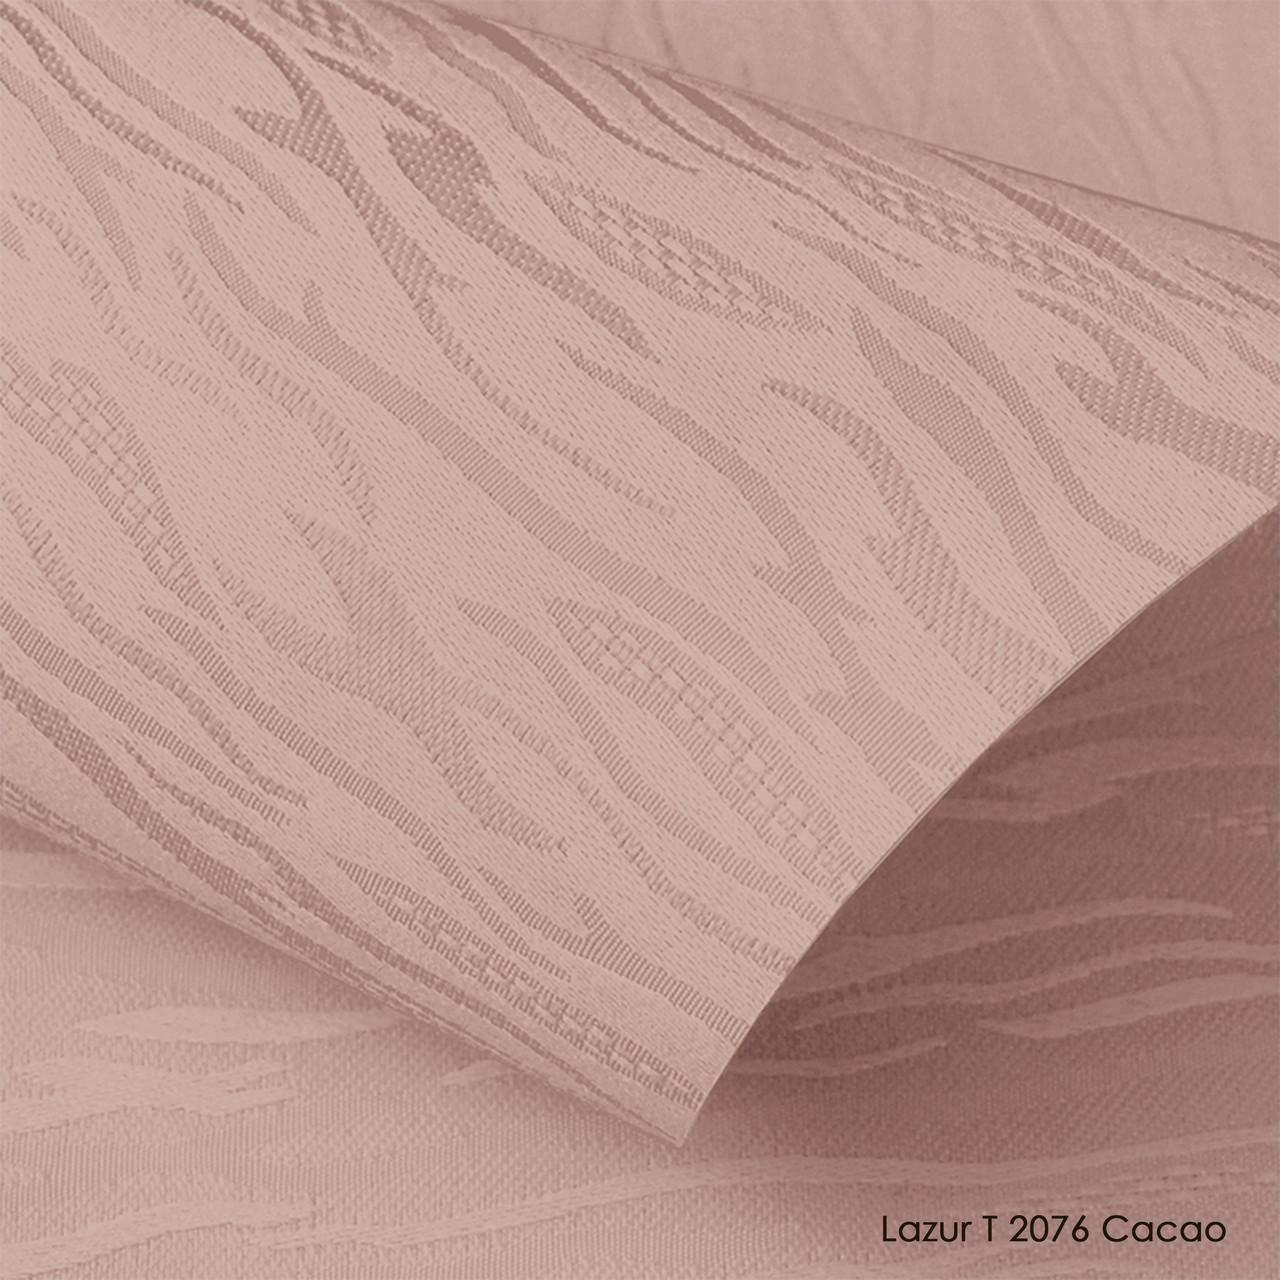 Ролети тканинні Lazur T 2076 Cacao